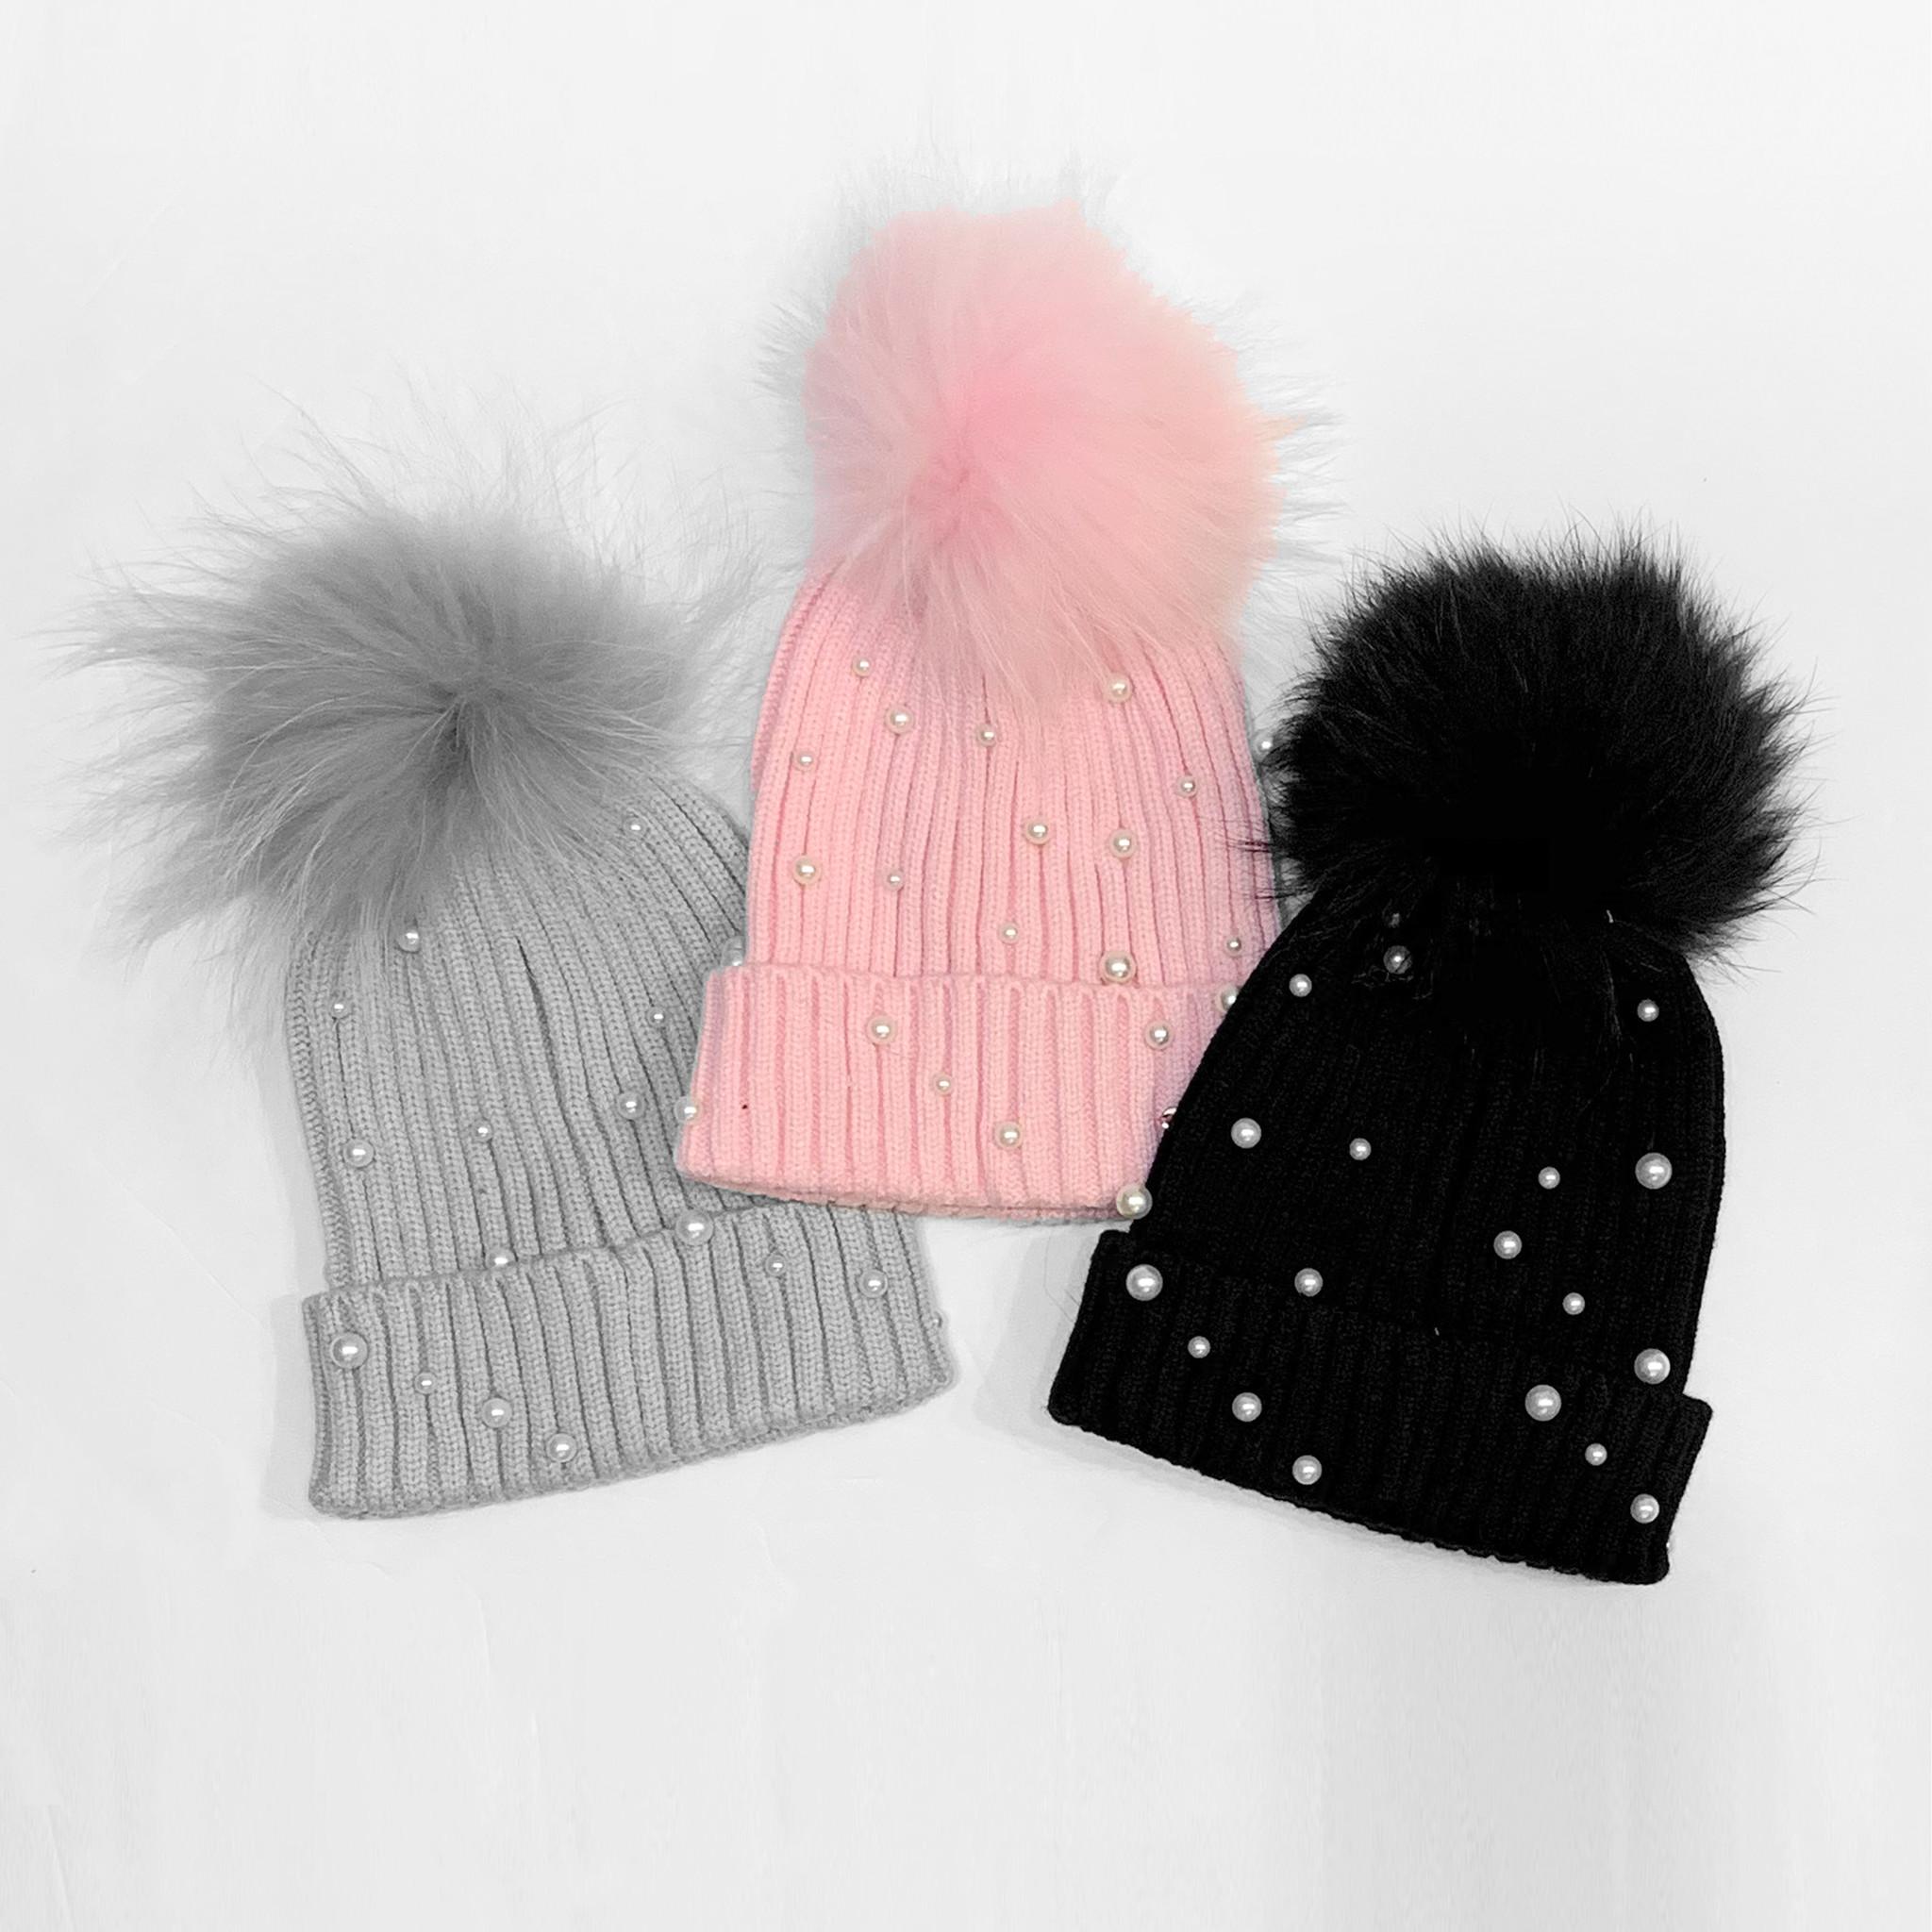 Bari Lynn Fur Pearl Winter Hats (3 colors)